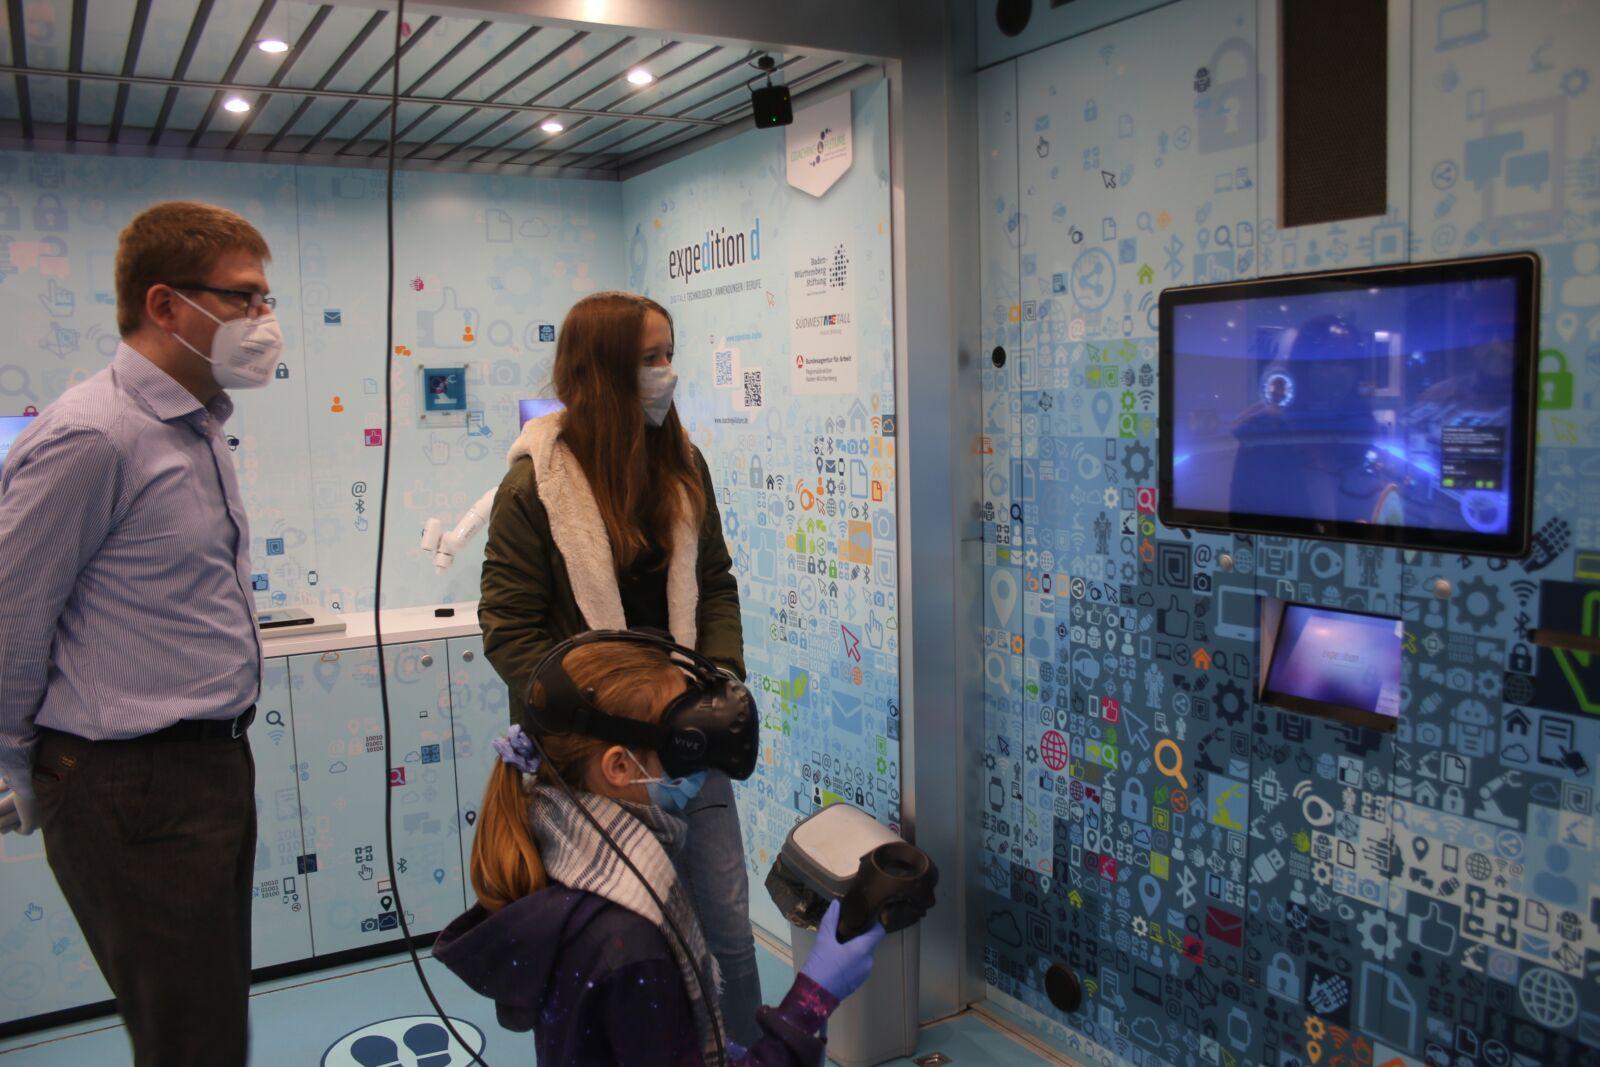 VIRTUELLER RUNDGANG Wilferdingen Virtueller Rundgang Virtuelle Tour Tour Tag der offenen Tür Schule Remchingen Klassen Digitalisierung Digitale Schule Carl Dittler Realschule 360 Grad Video